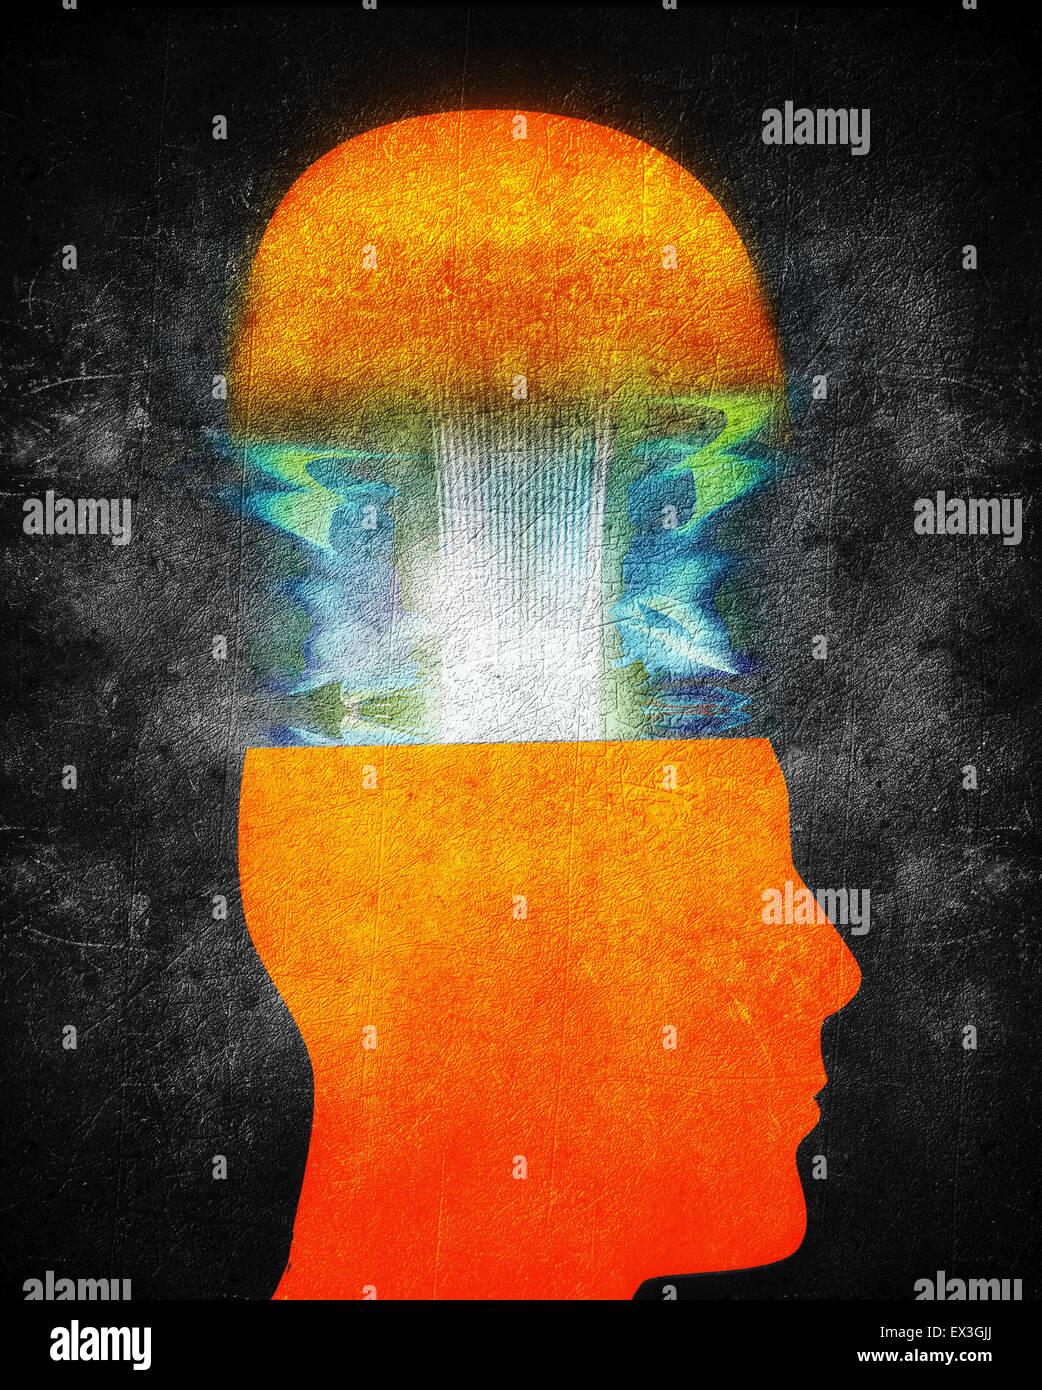 Kreativität-Konzept-Illustration mit orange Menschenkopf Stockbild